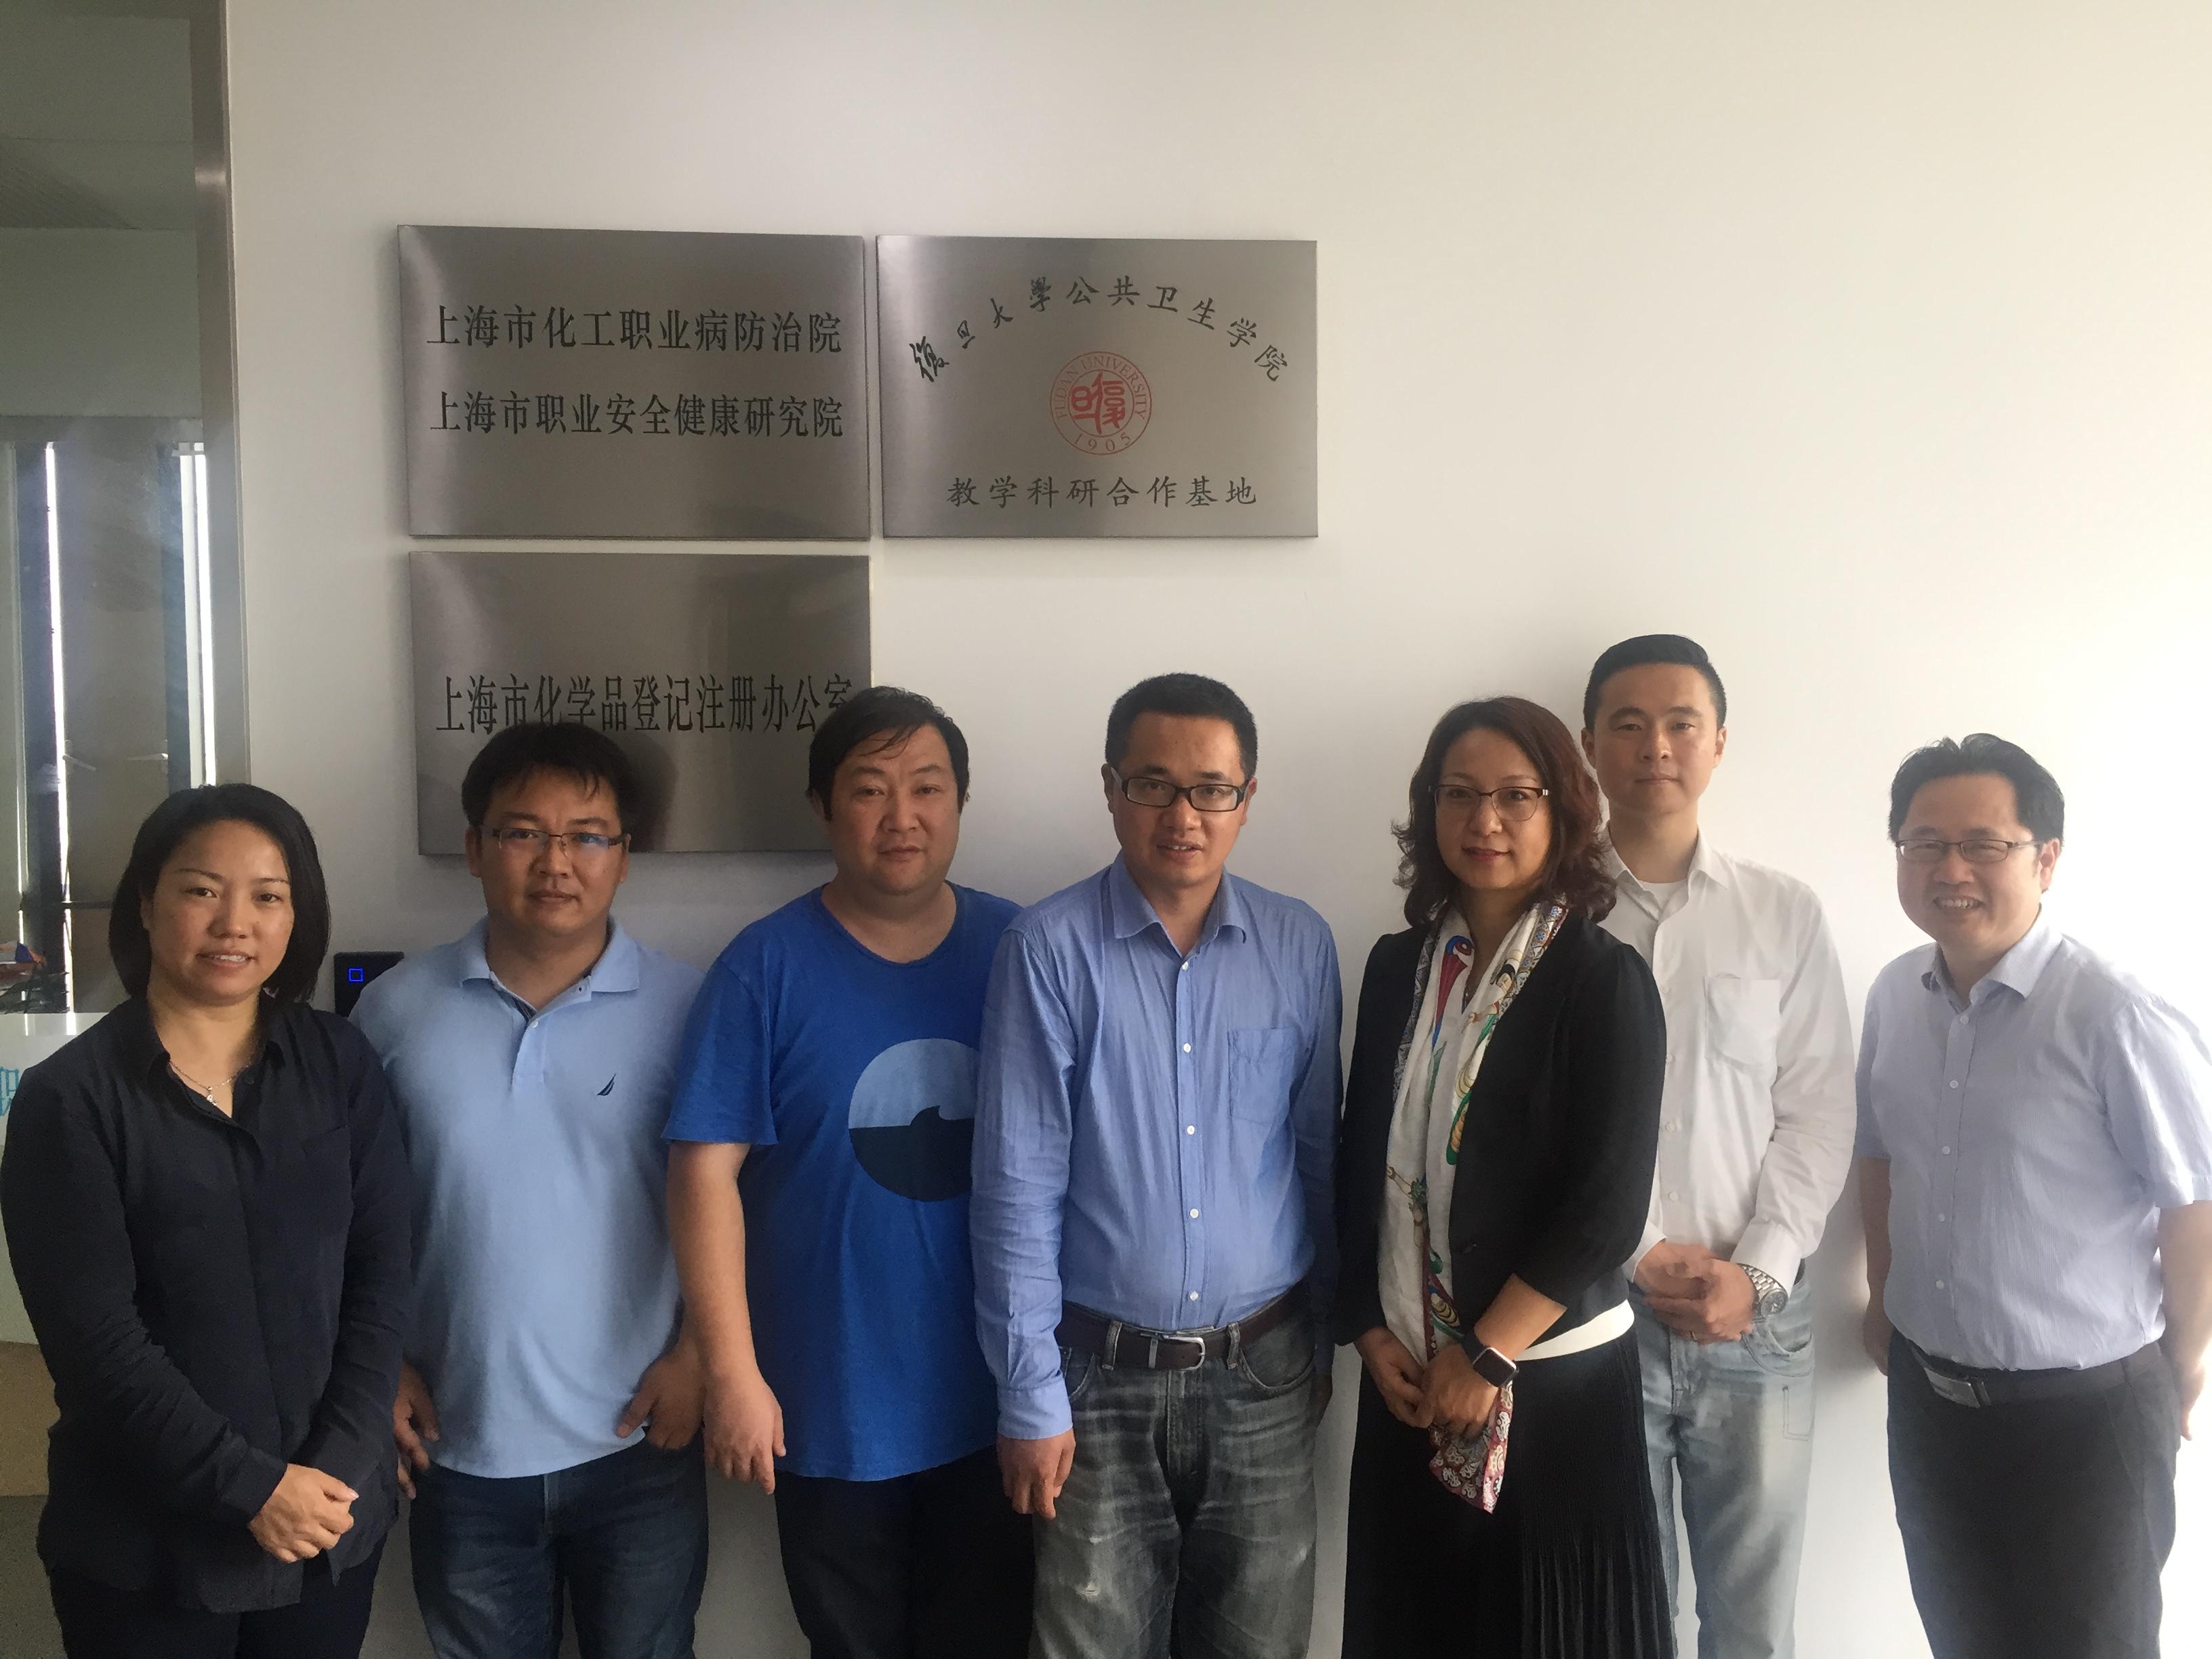 AICM产业政策促进委员会拜访上海危险化学品登记办